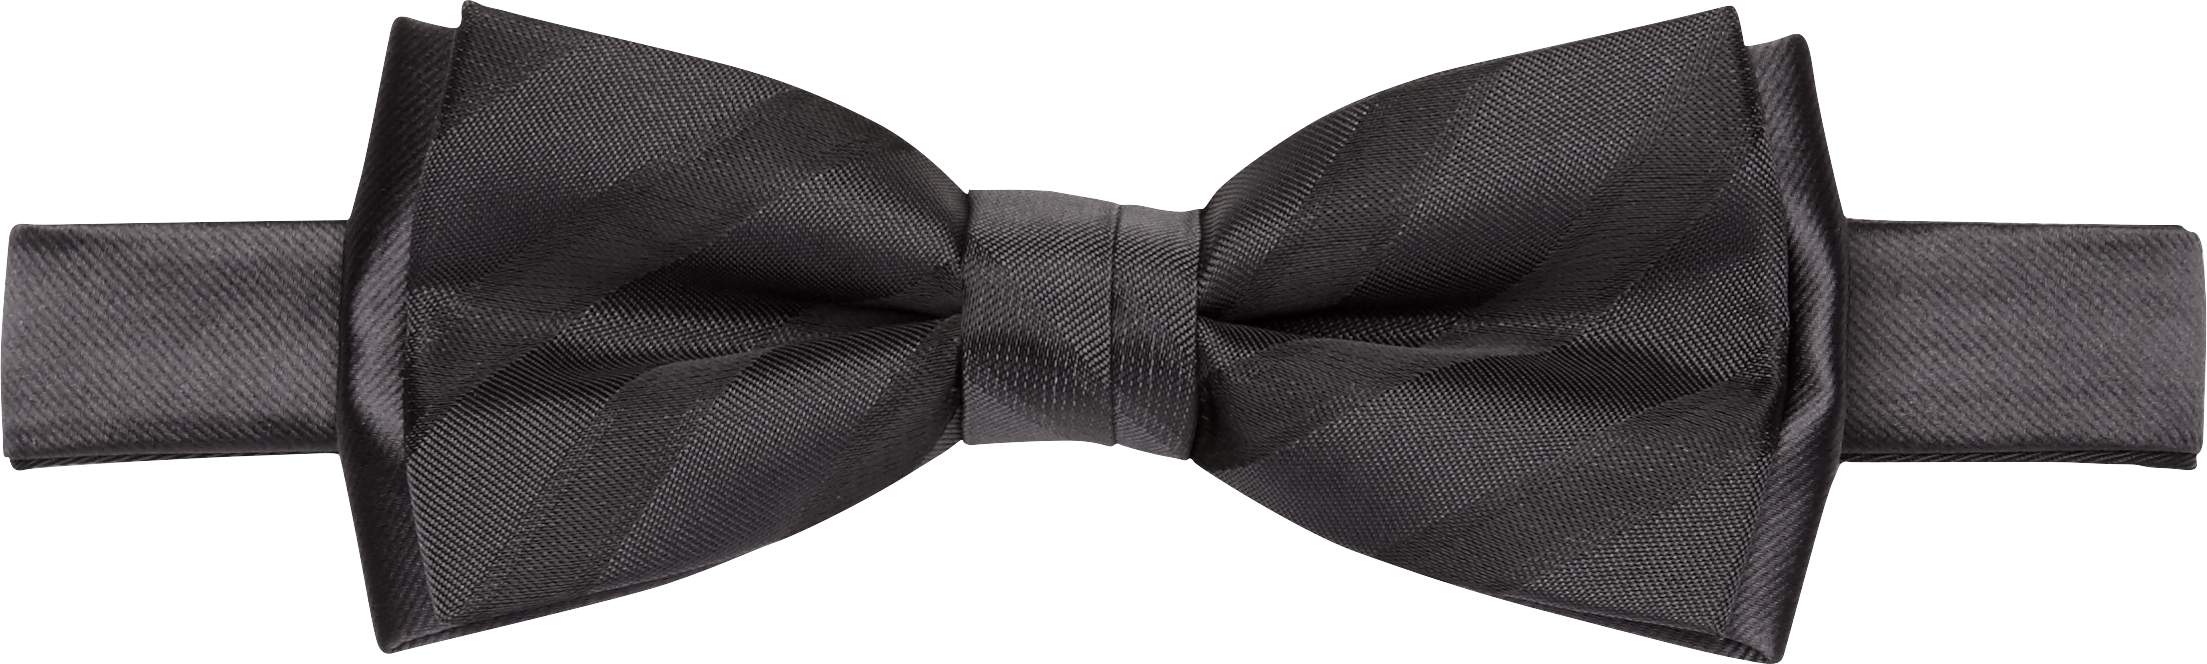 34bce865e075 Calvin Klein Black Small Bow Tie - Mens Home - Men s Wearhouse